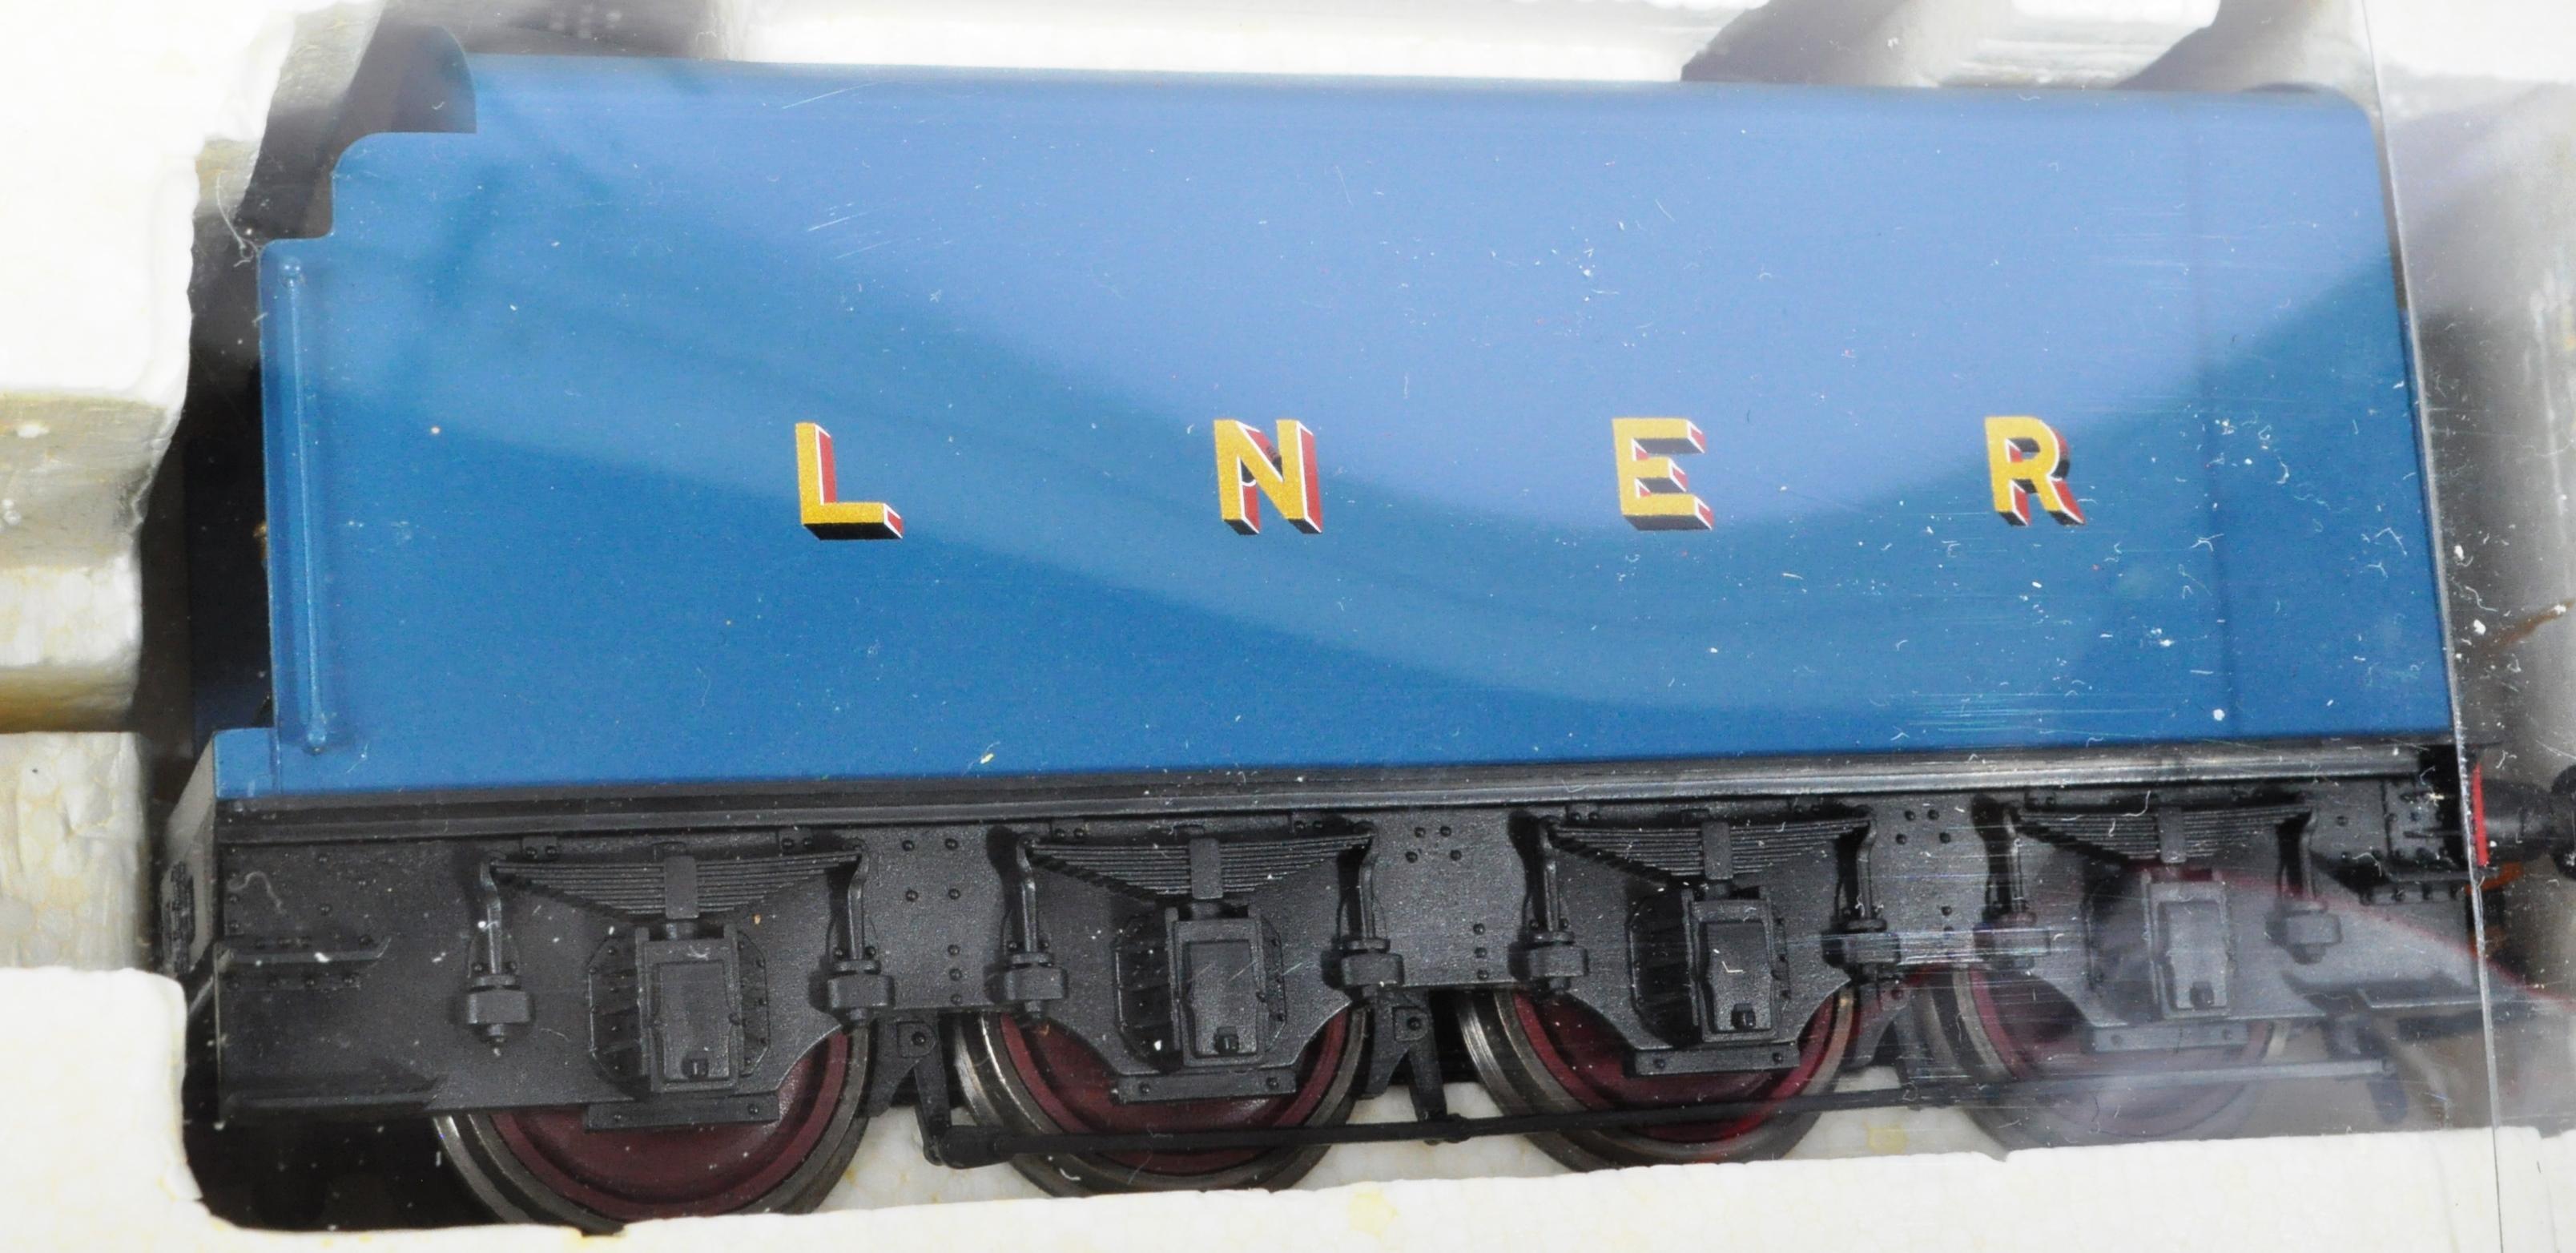 ORIGINAL HORNBY 00 GAUGE MODEL RAILWAY TRAINSET LOCOMOTIVE - Image 4 of 5